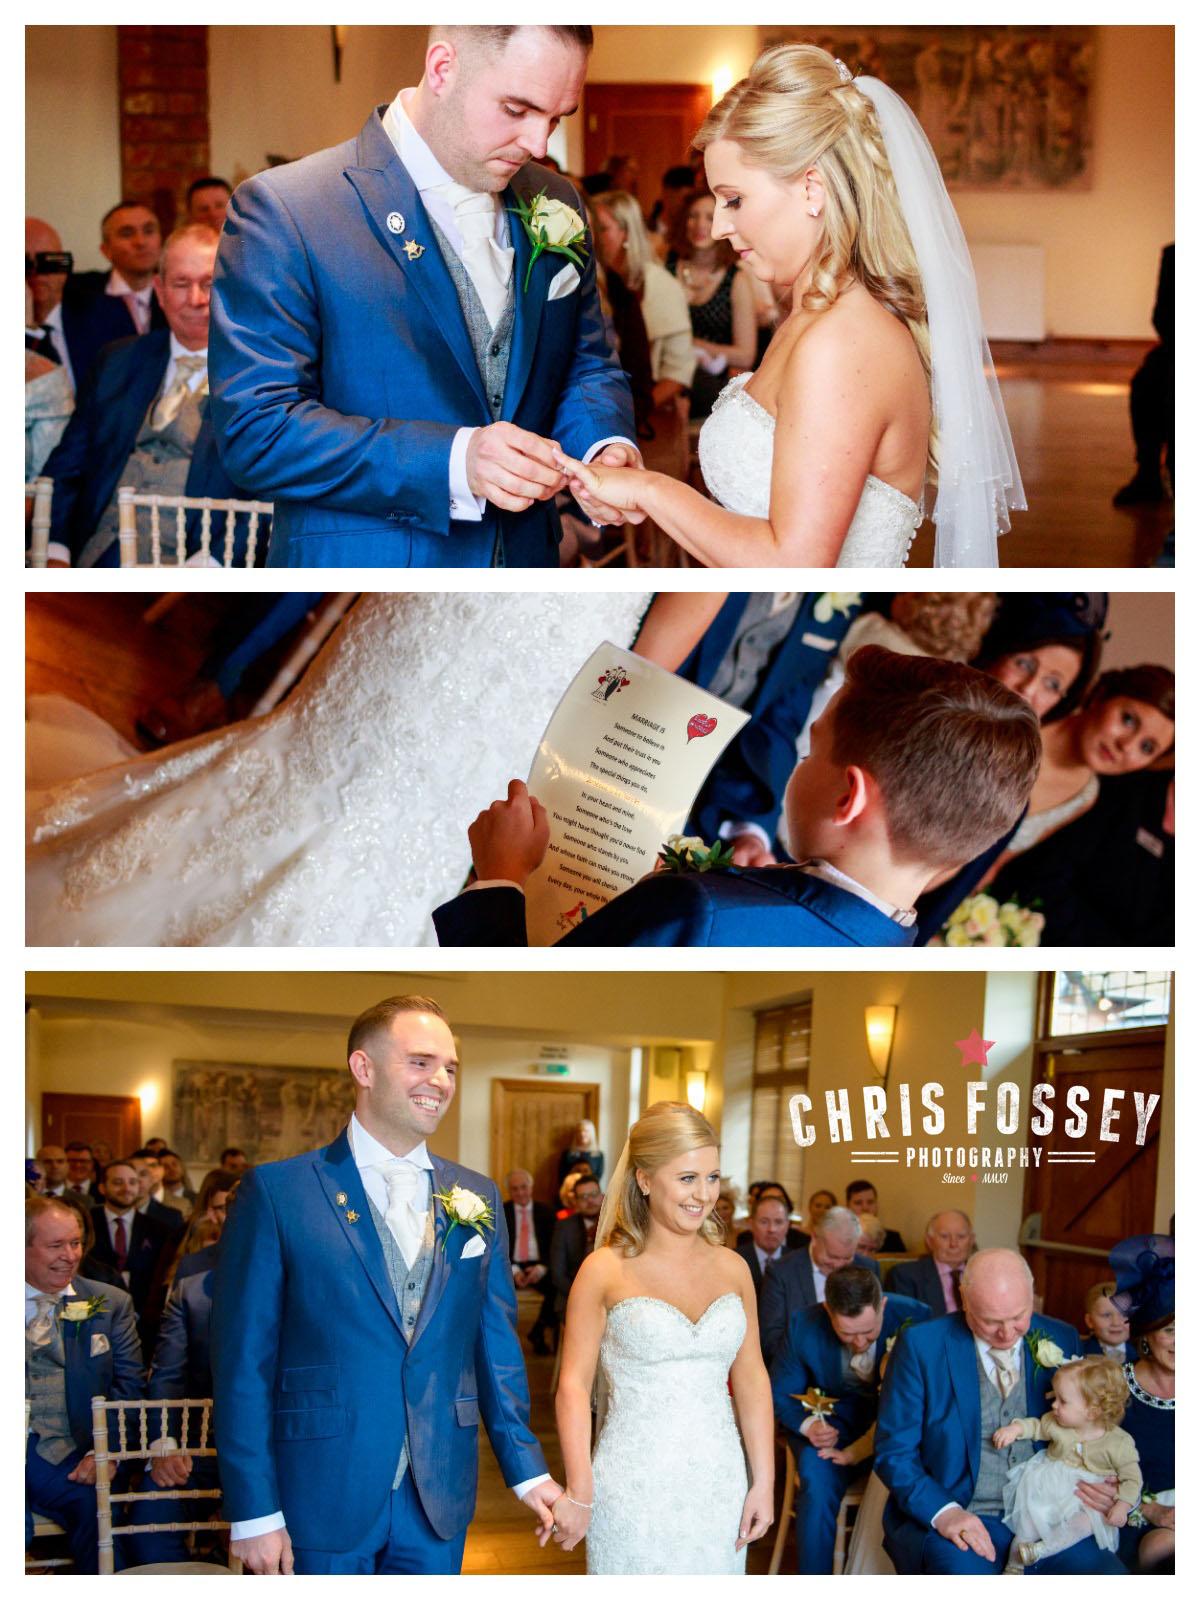 Nuthurst Grange Hotel Gorgeous Natural Wedding Photography Warwickshire Chris Fossey B94 5NL 07